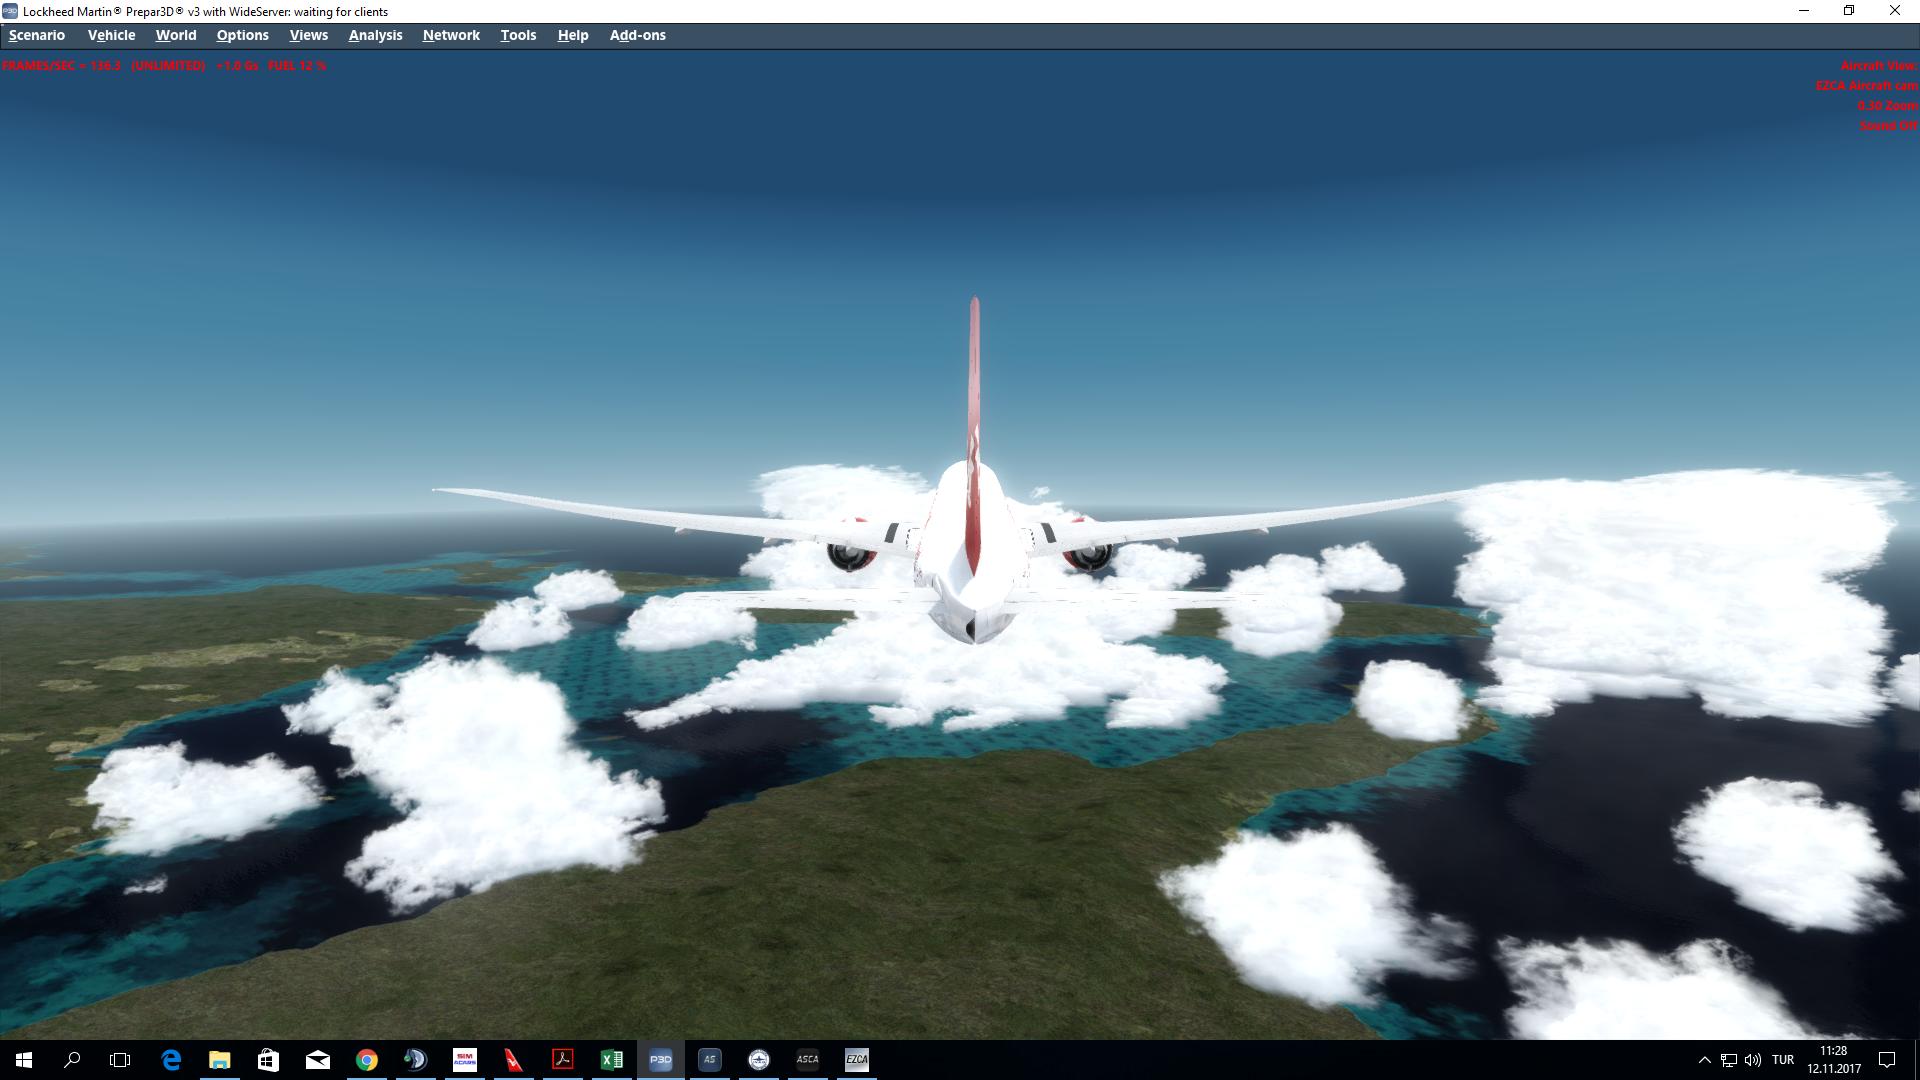 Desktop Screenshot 2017.11.12 - 11.28.28.41